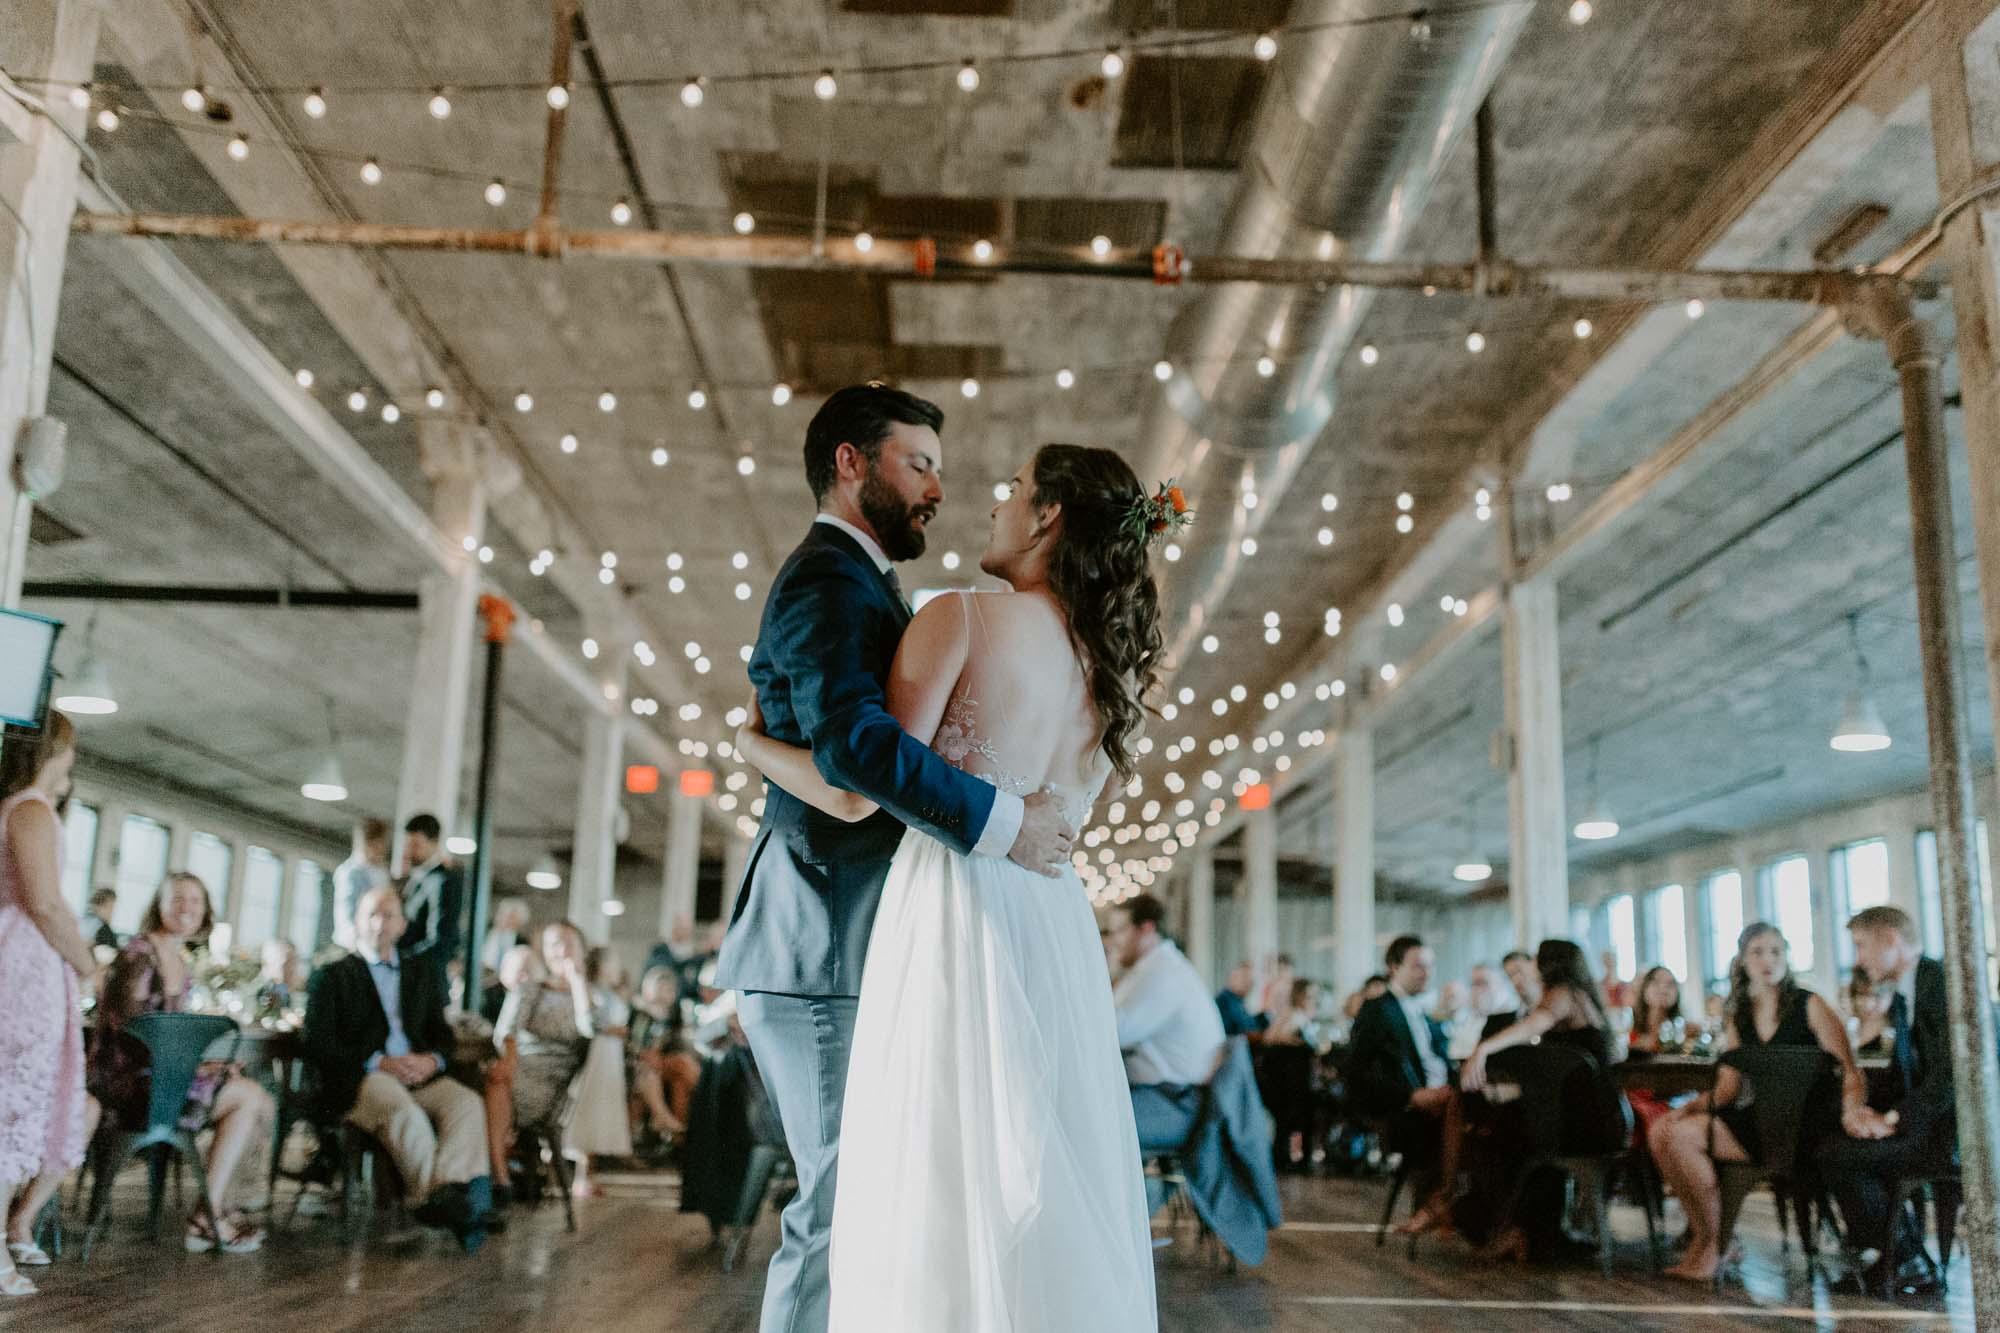 journeyman_distillery_wedding_photographer_chicago_il_wright_photographs-5017.jpg